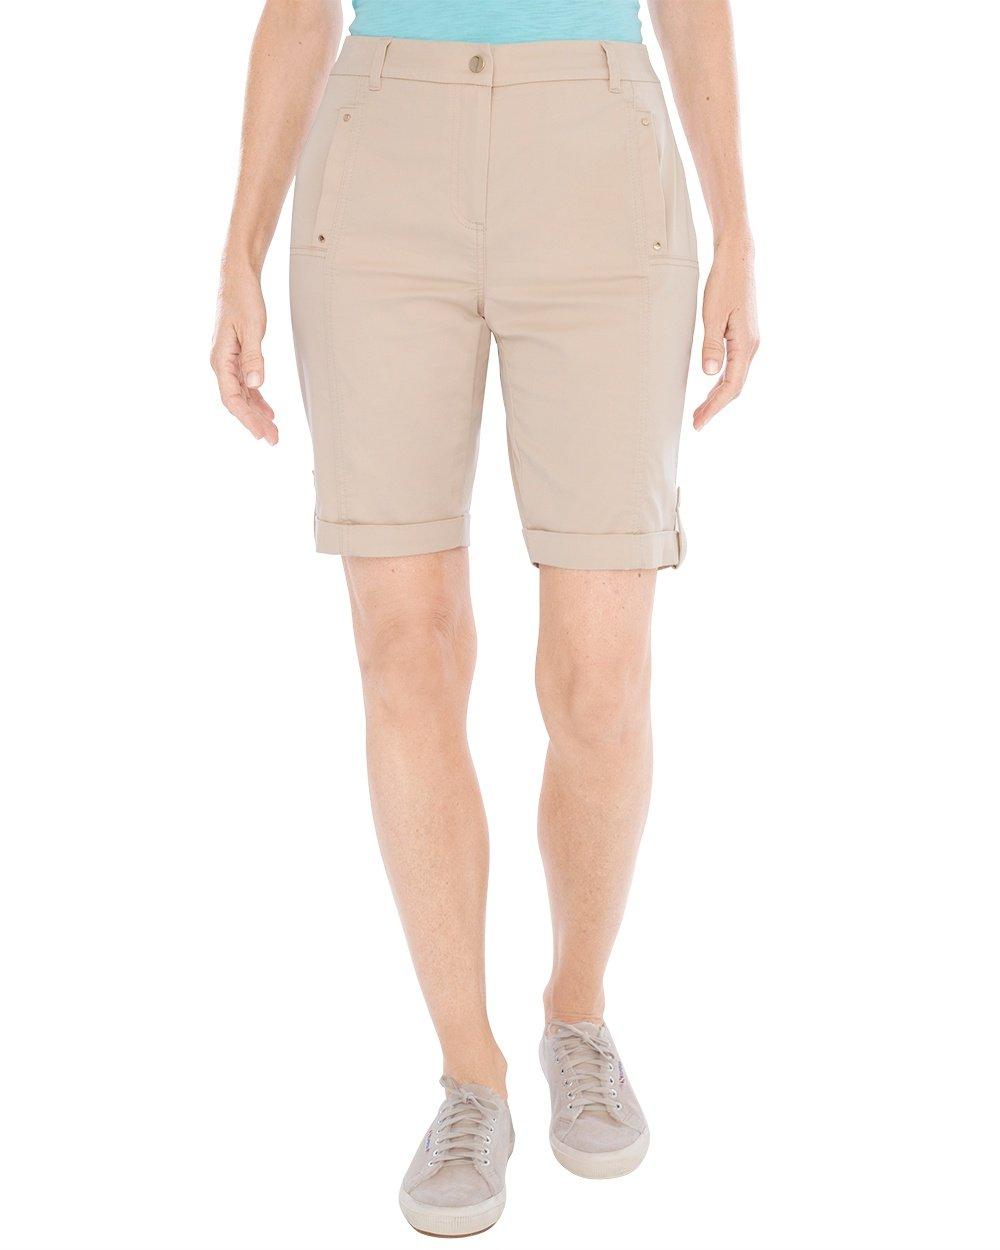 Chico's Women's Comfort Waist Utility Shorts- 10 inch Inseam Size 10 M (1.5) Tan